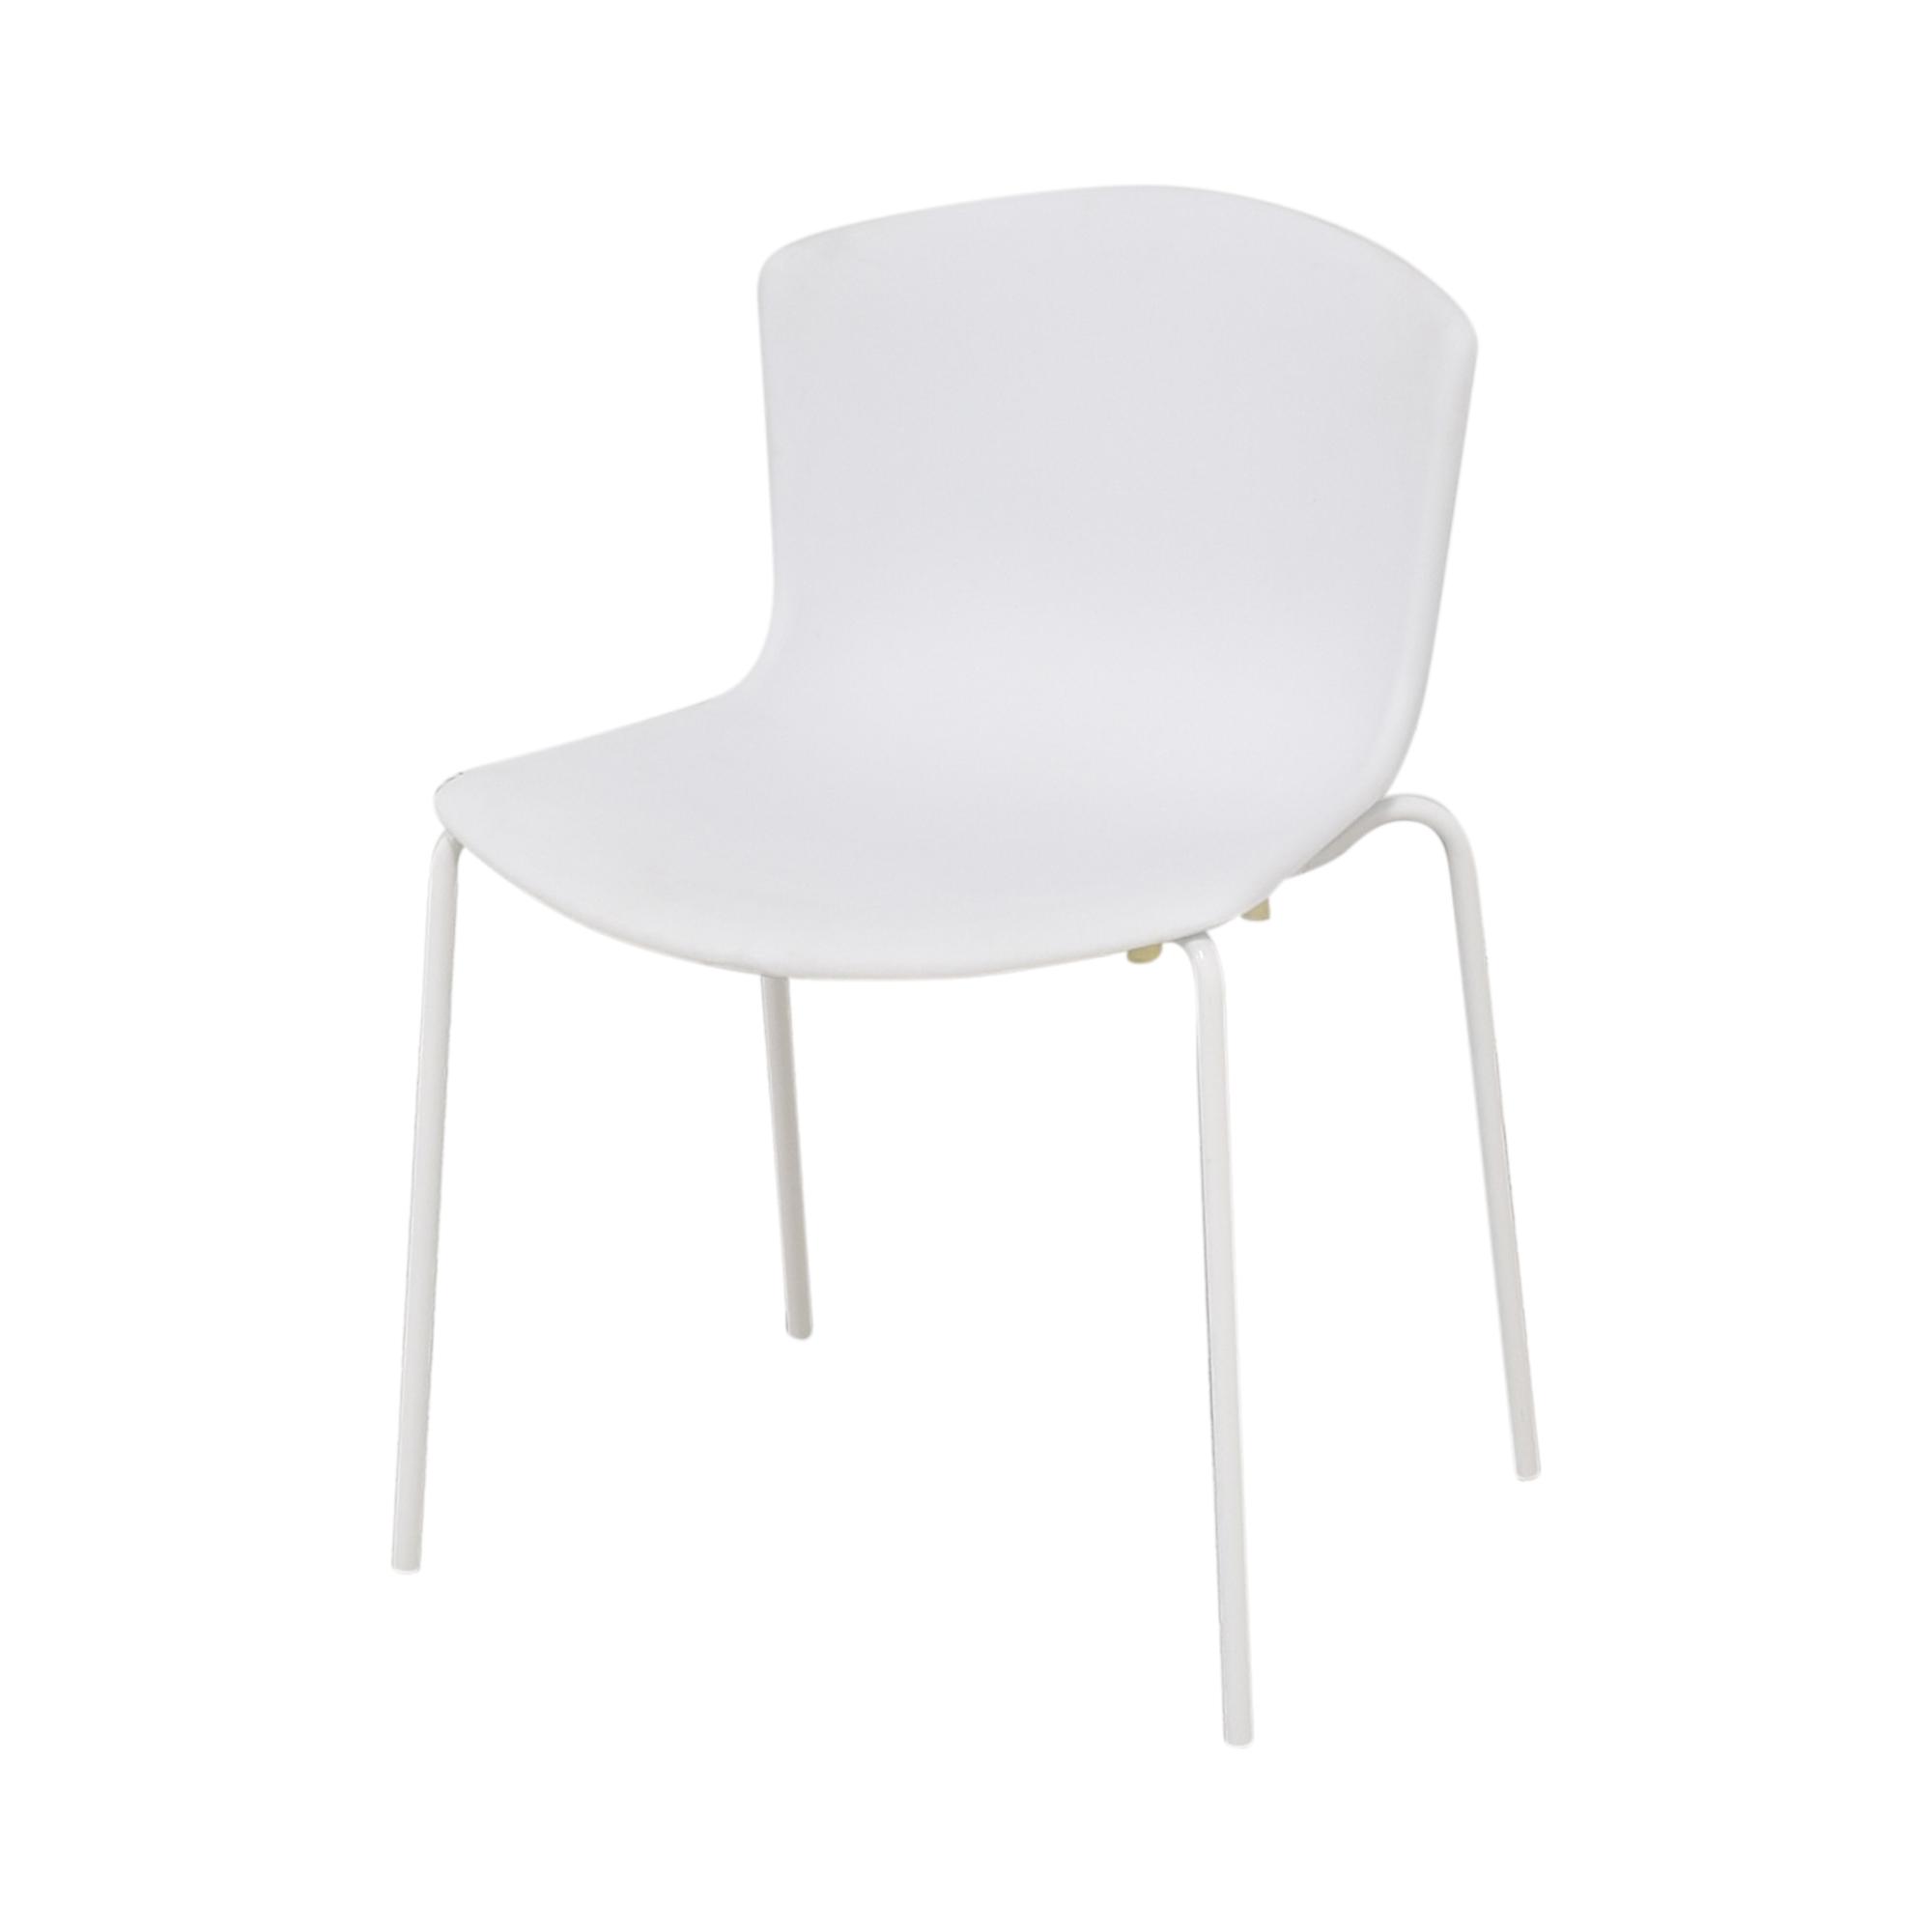 shop Knoll Knoll Bertoia Molded Shell Side Chair online